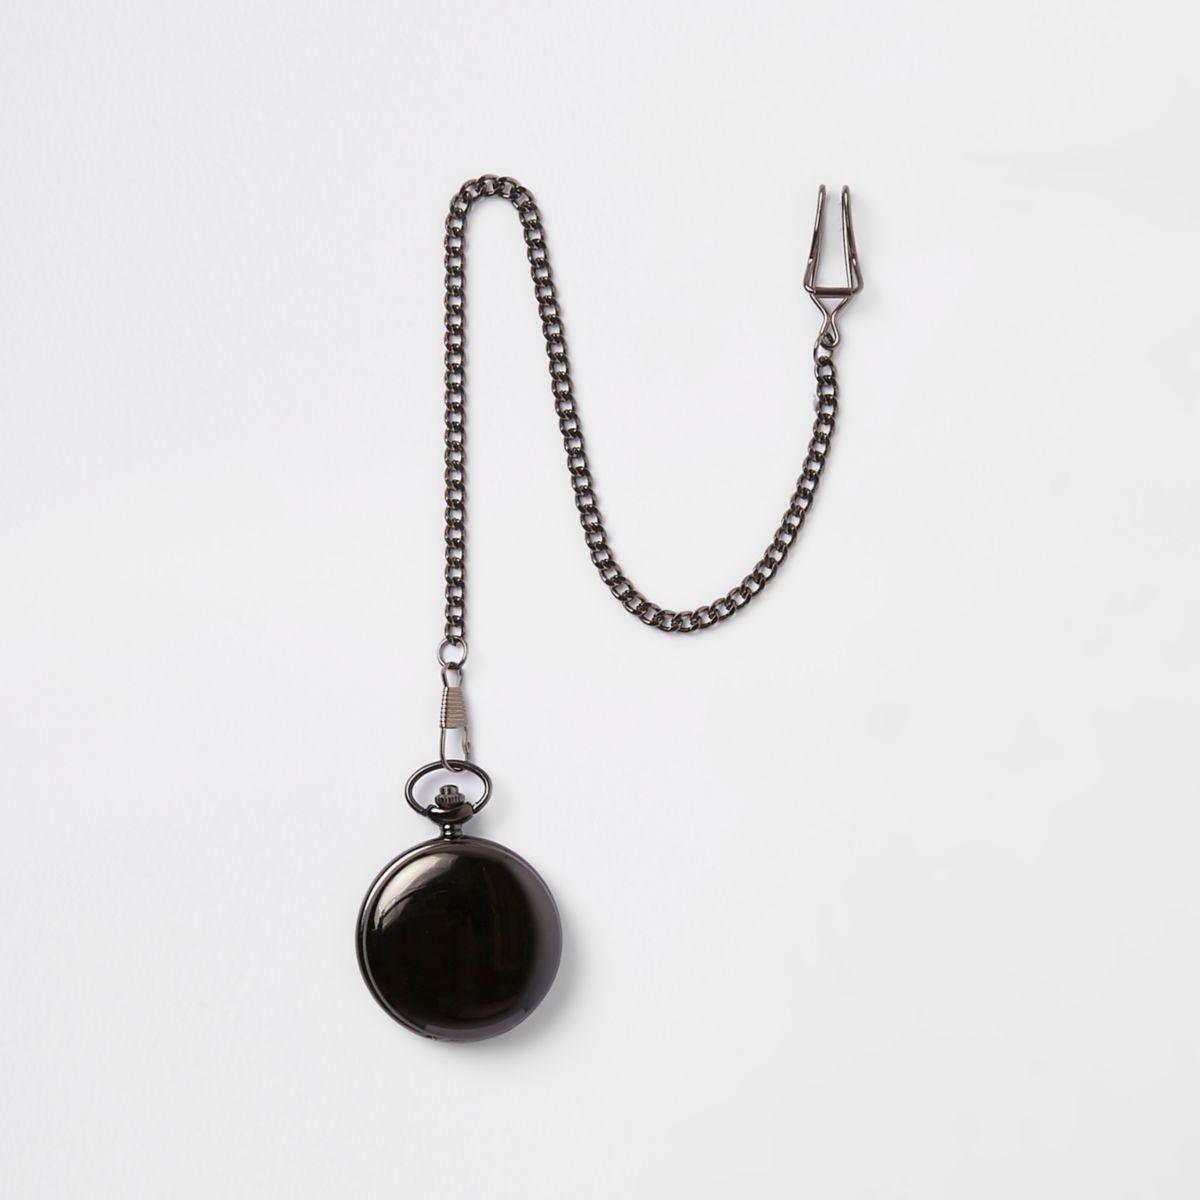 Dark grey gunmetal pocket watch